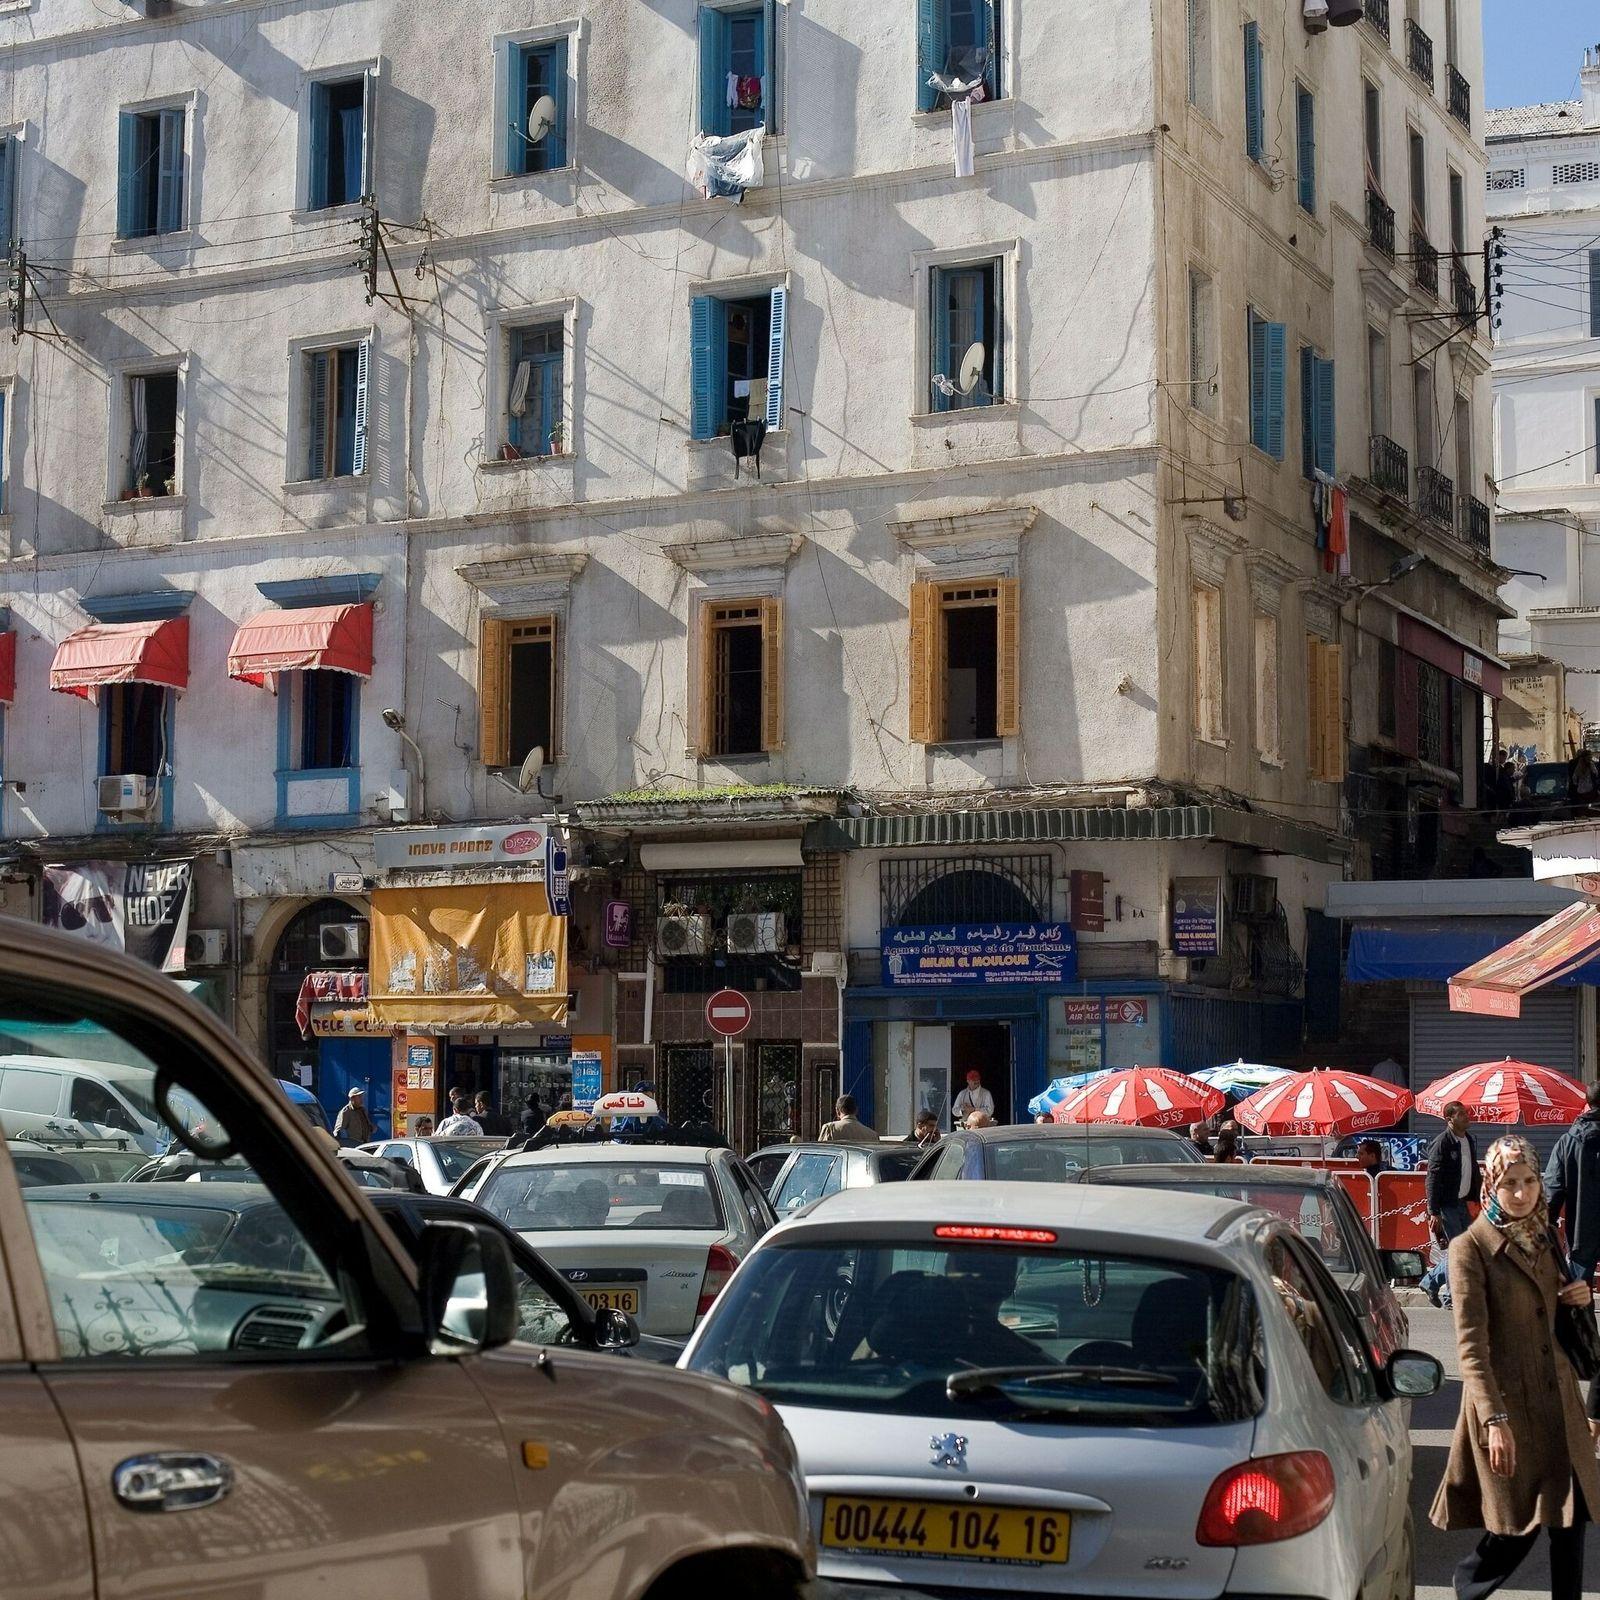 Coches de gasolina en Argelia